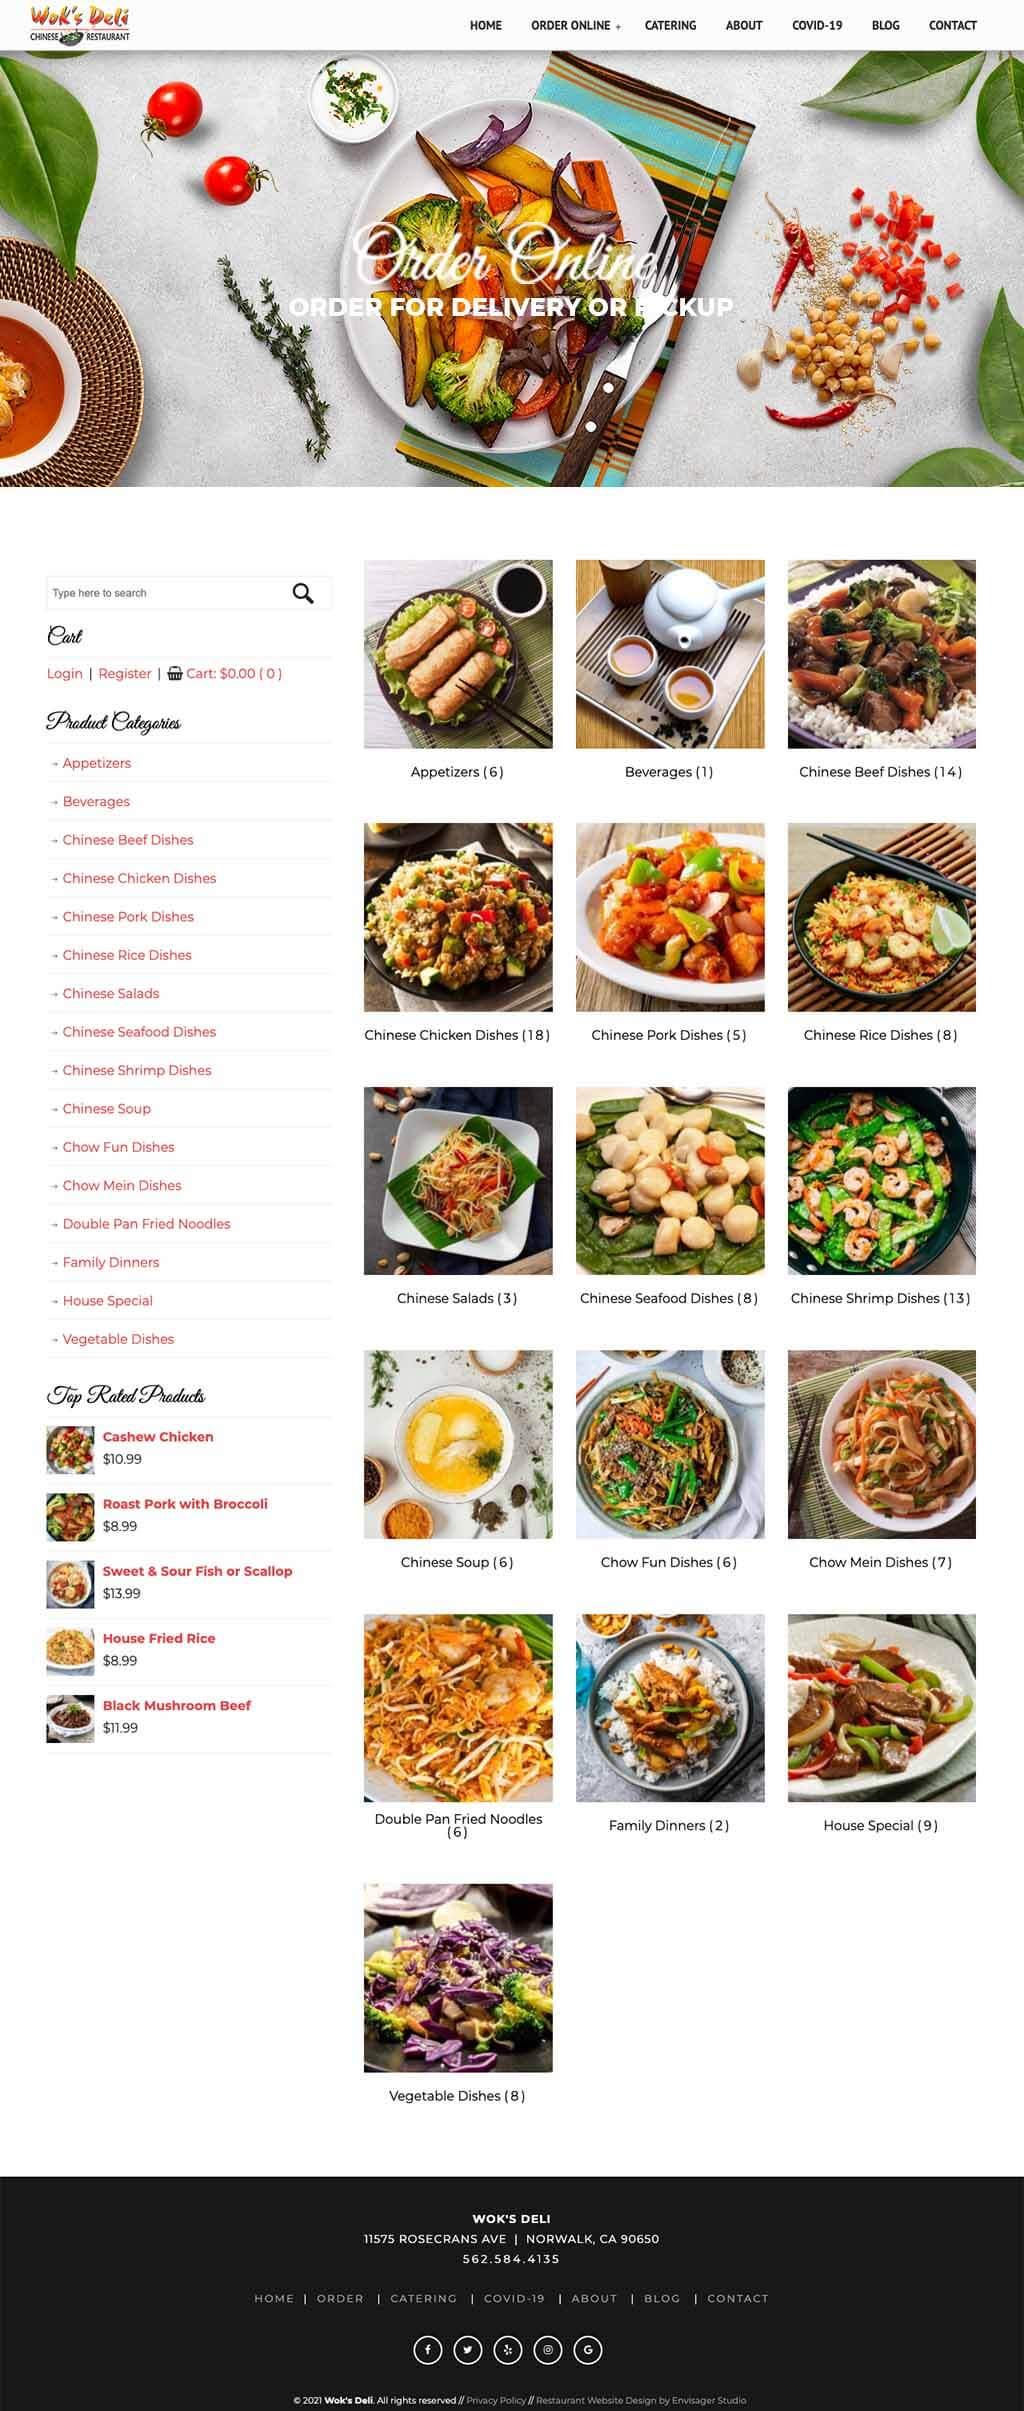 Wok's Deli Chinese Food Website Design